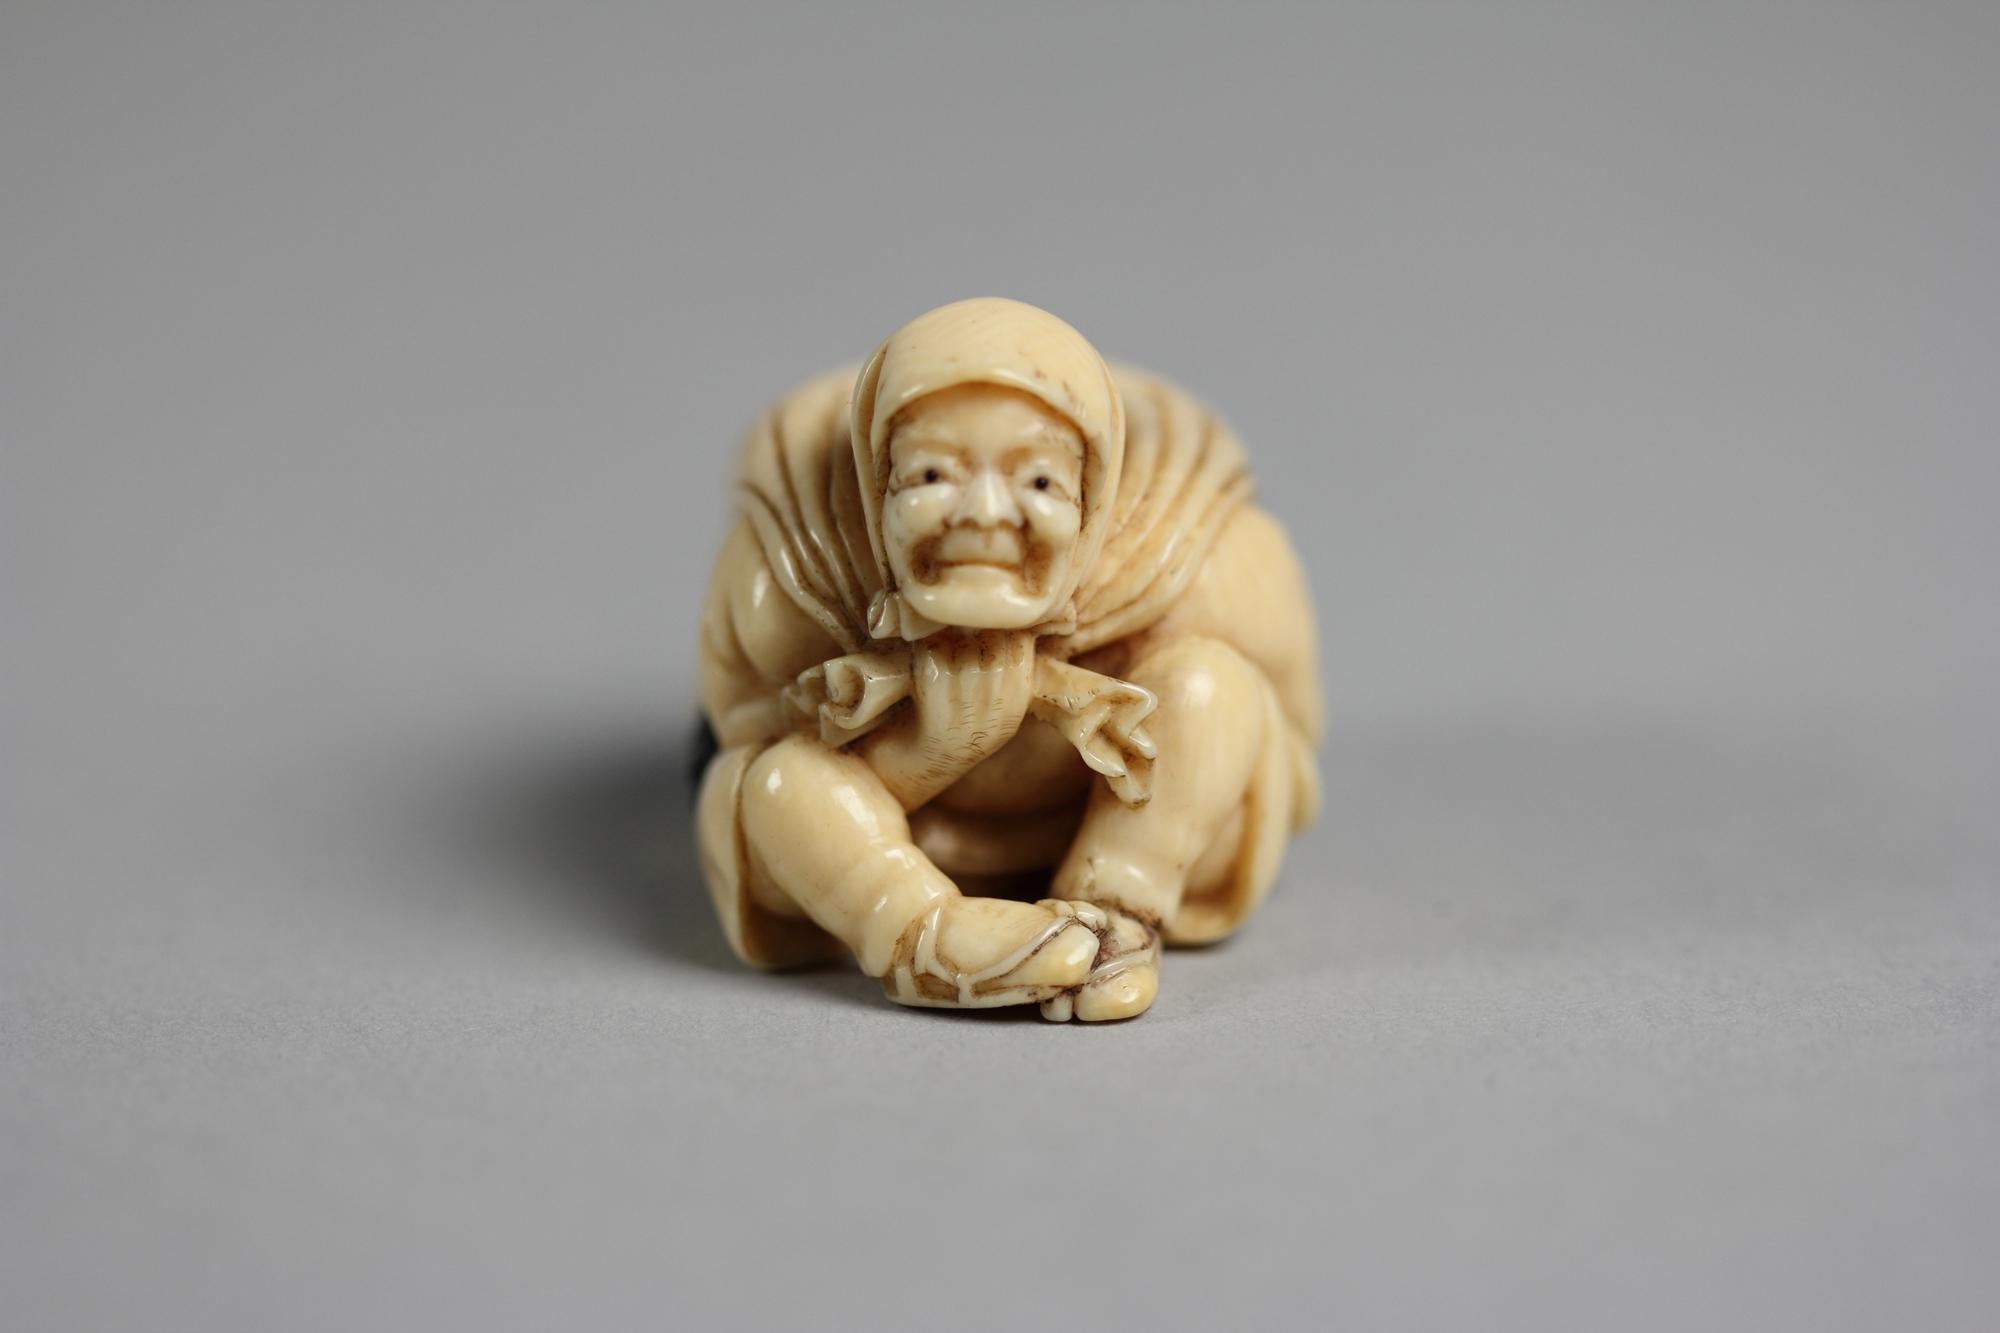 Netsuke Of Old Man Carrying A Bag Of ōni Demons Japan Edo 1615 1868 Or Meiji Period 1868 1912 The Metropolitan Museum Of Art